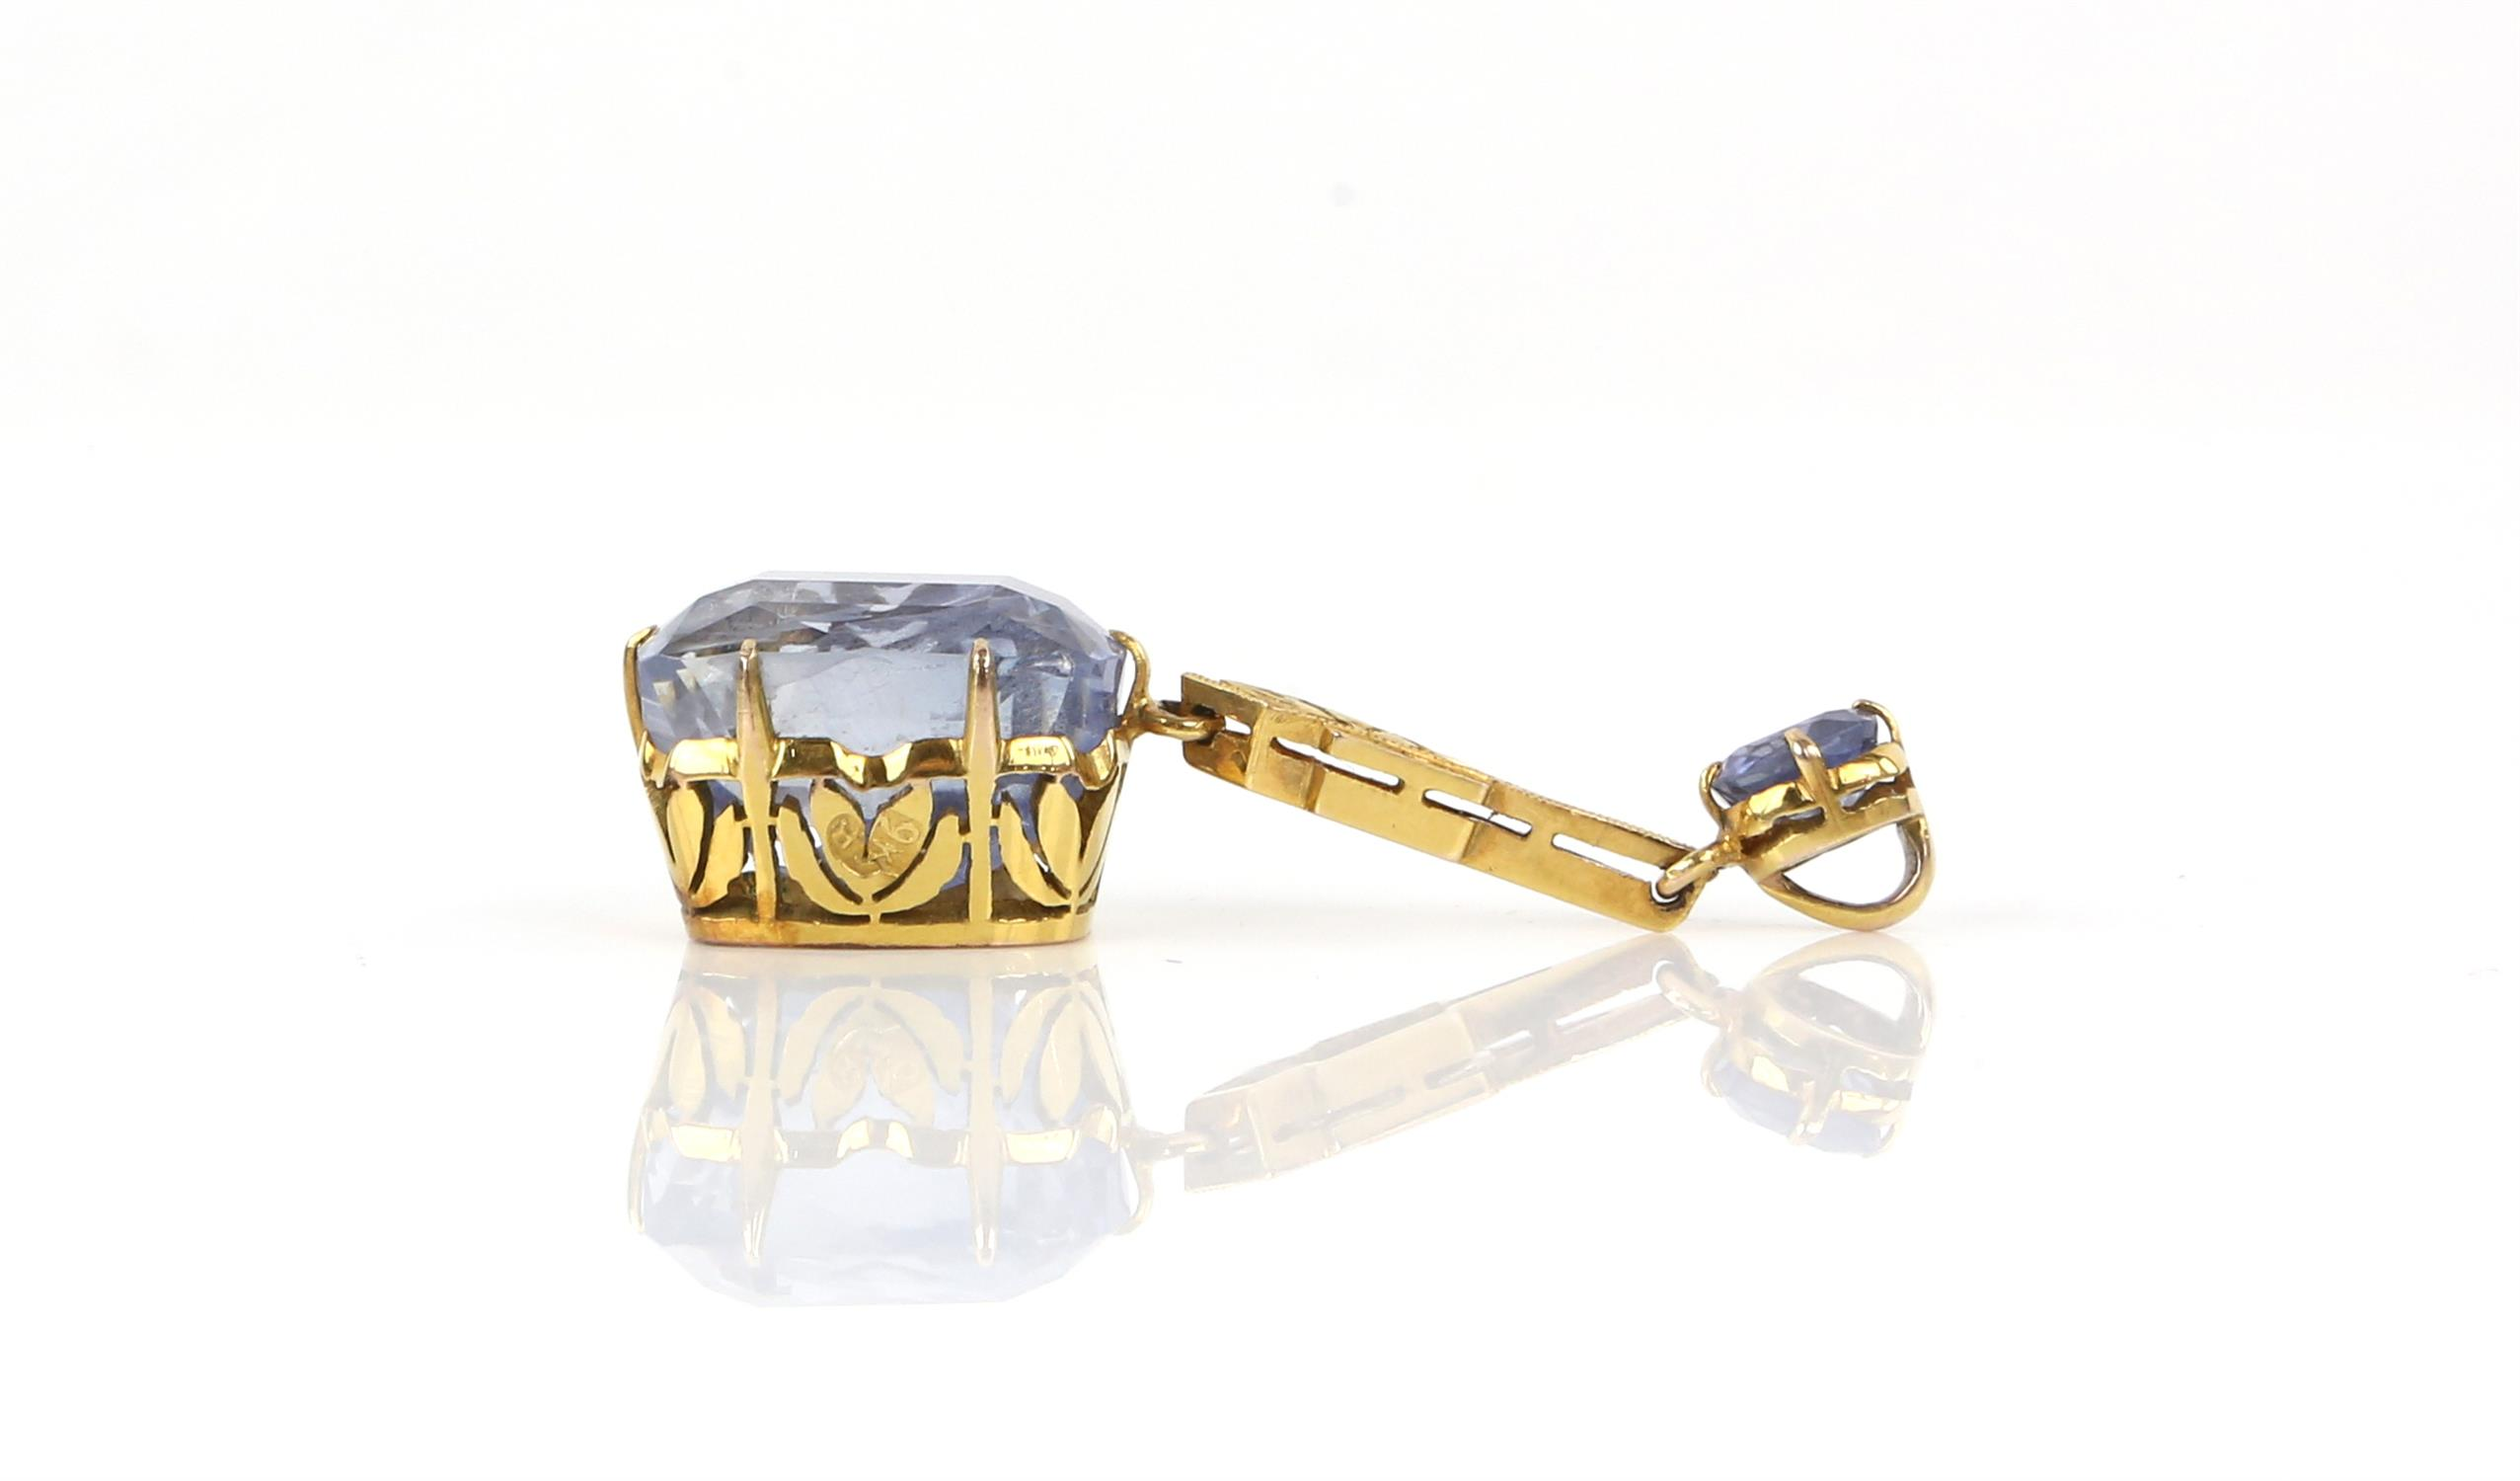 Sapphire drop pendant, principal light blue sapphire, estimated weight 12.99 carats, - Image 4 of 8